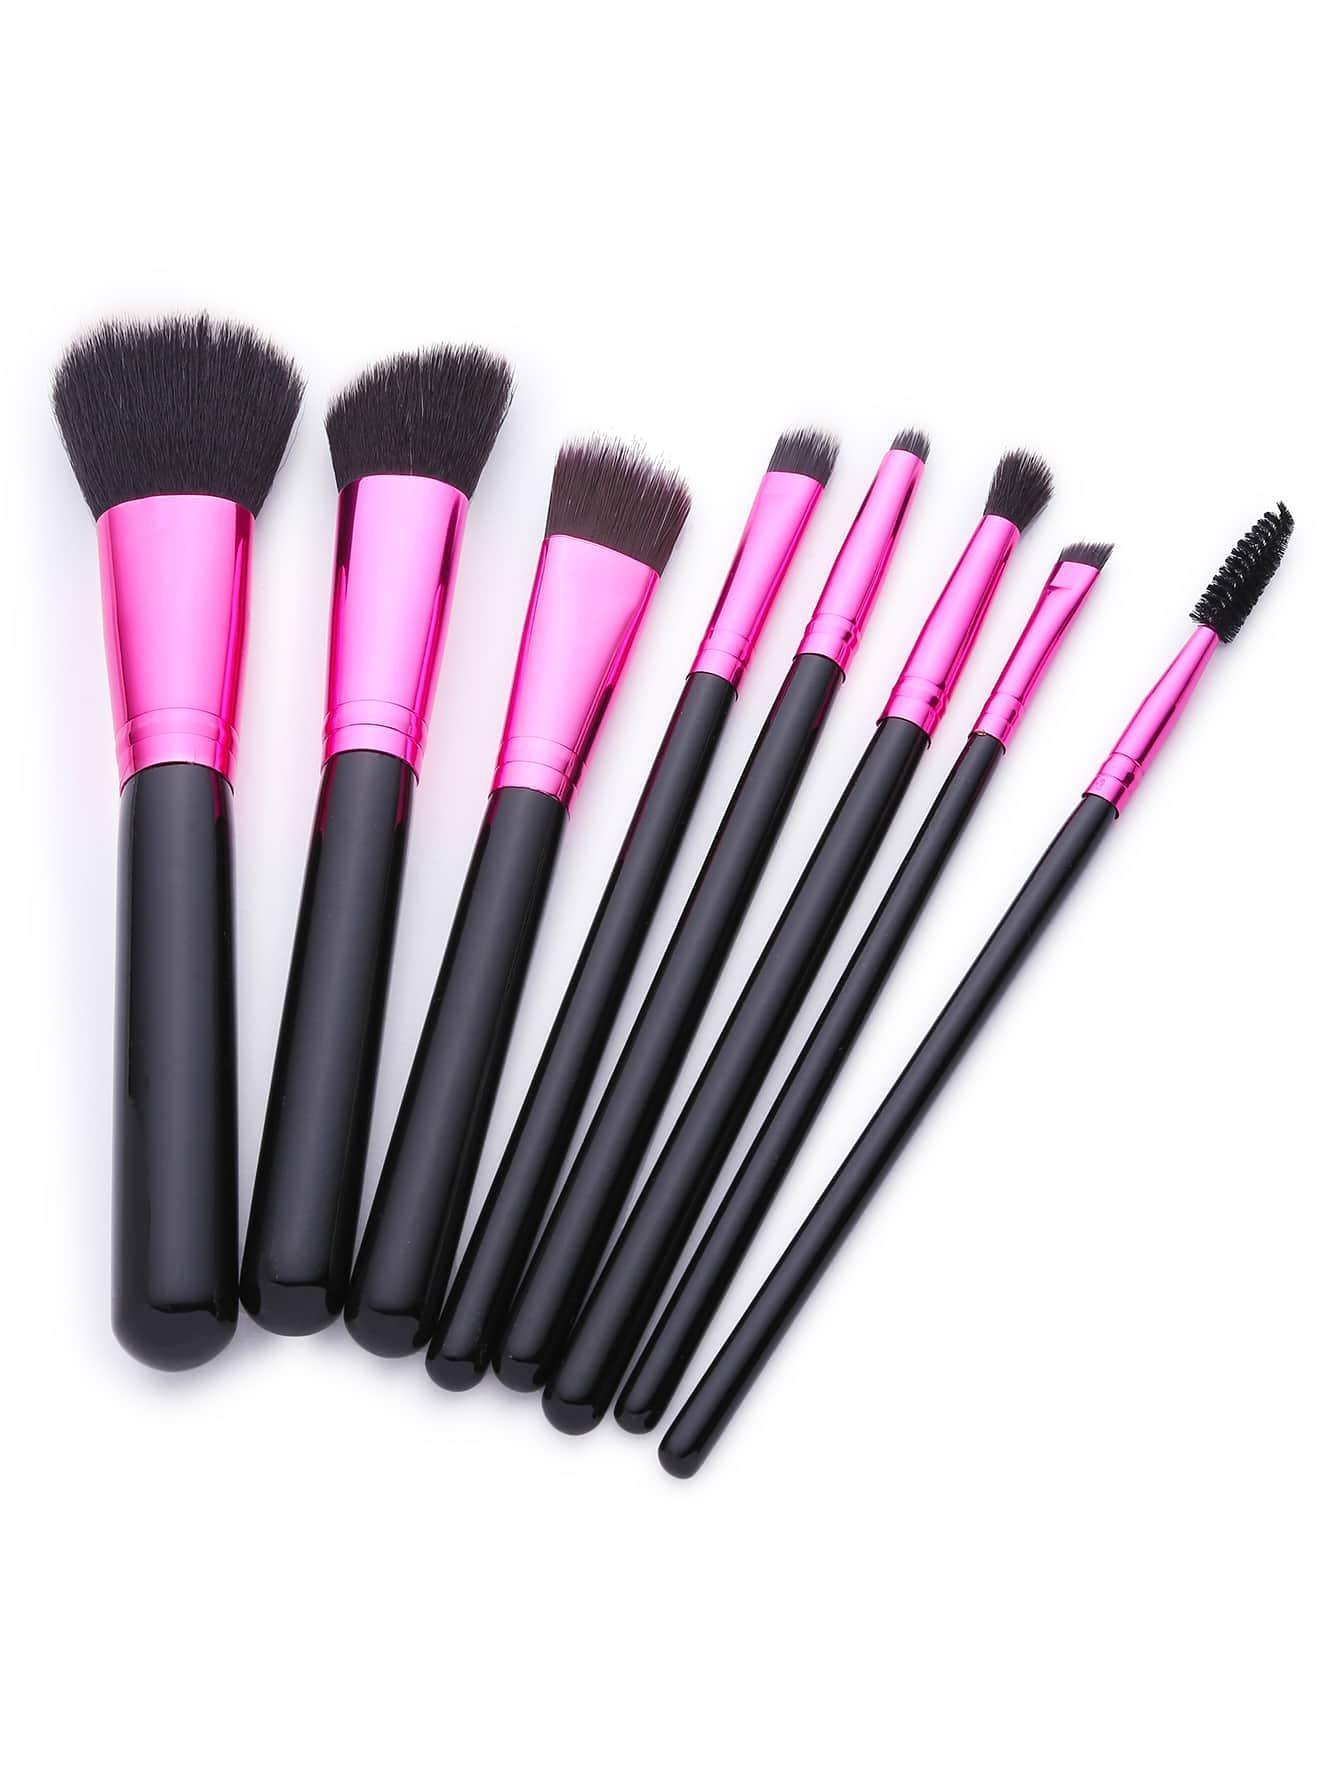 Фото 8PCS Wood Handle Cosmetic Brush Set. Купить с доставкой